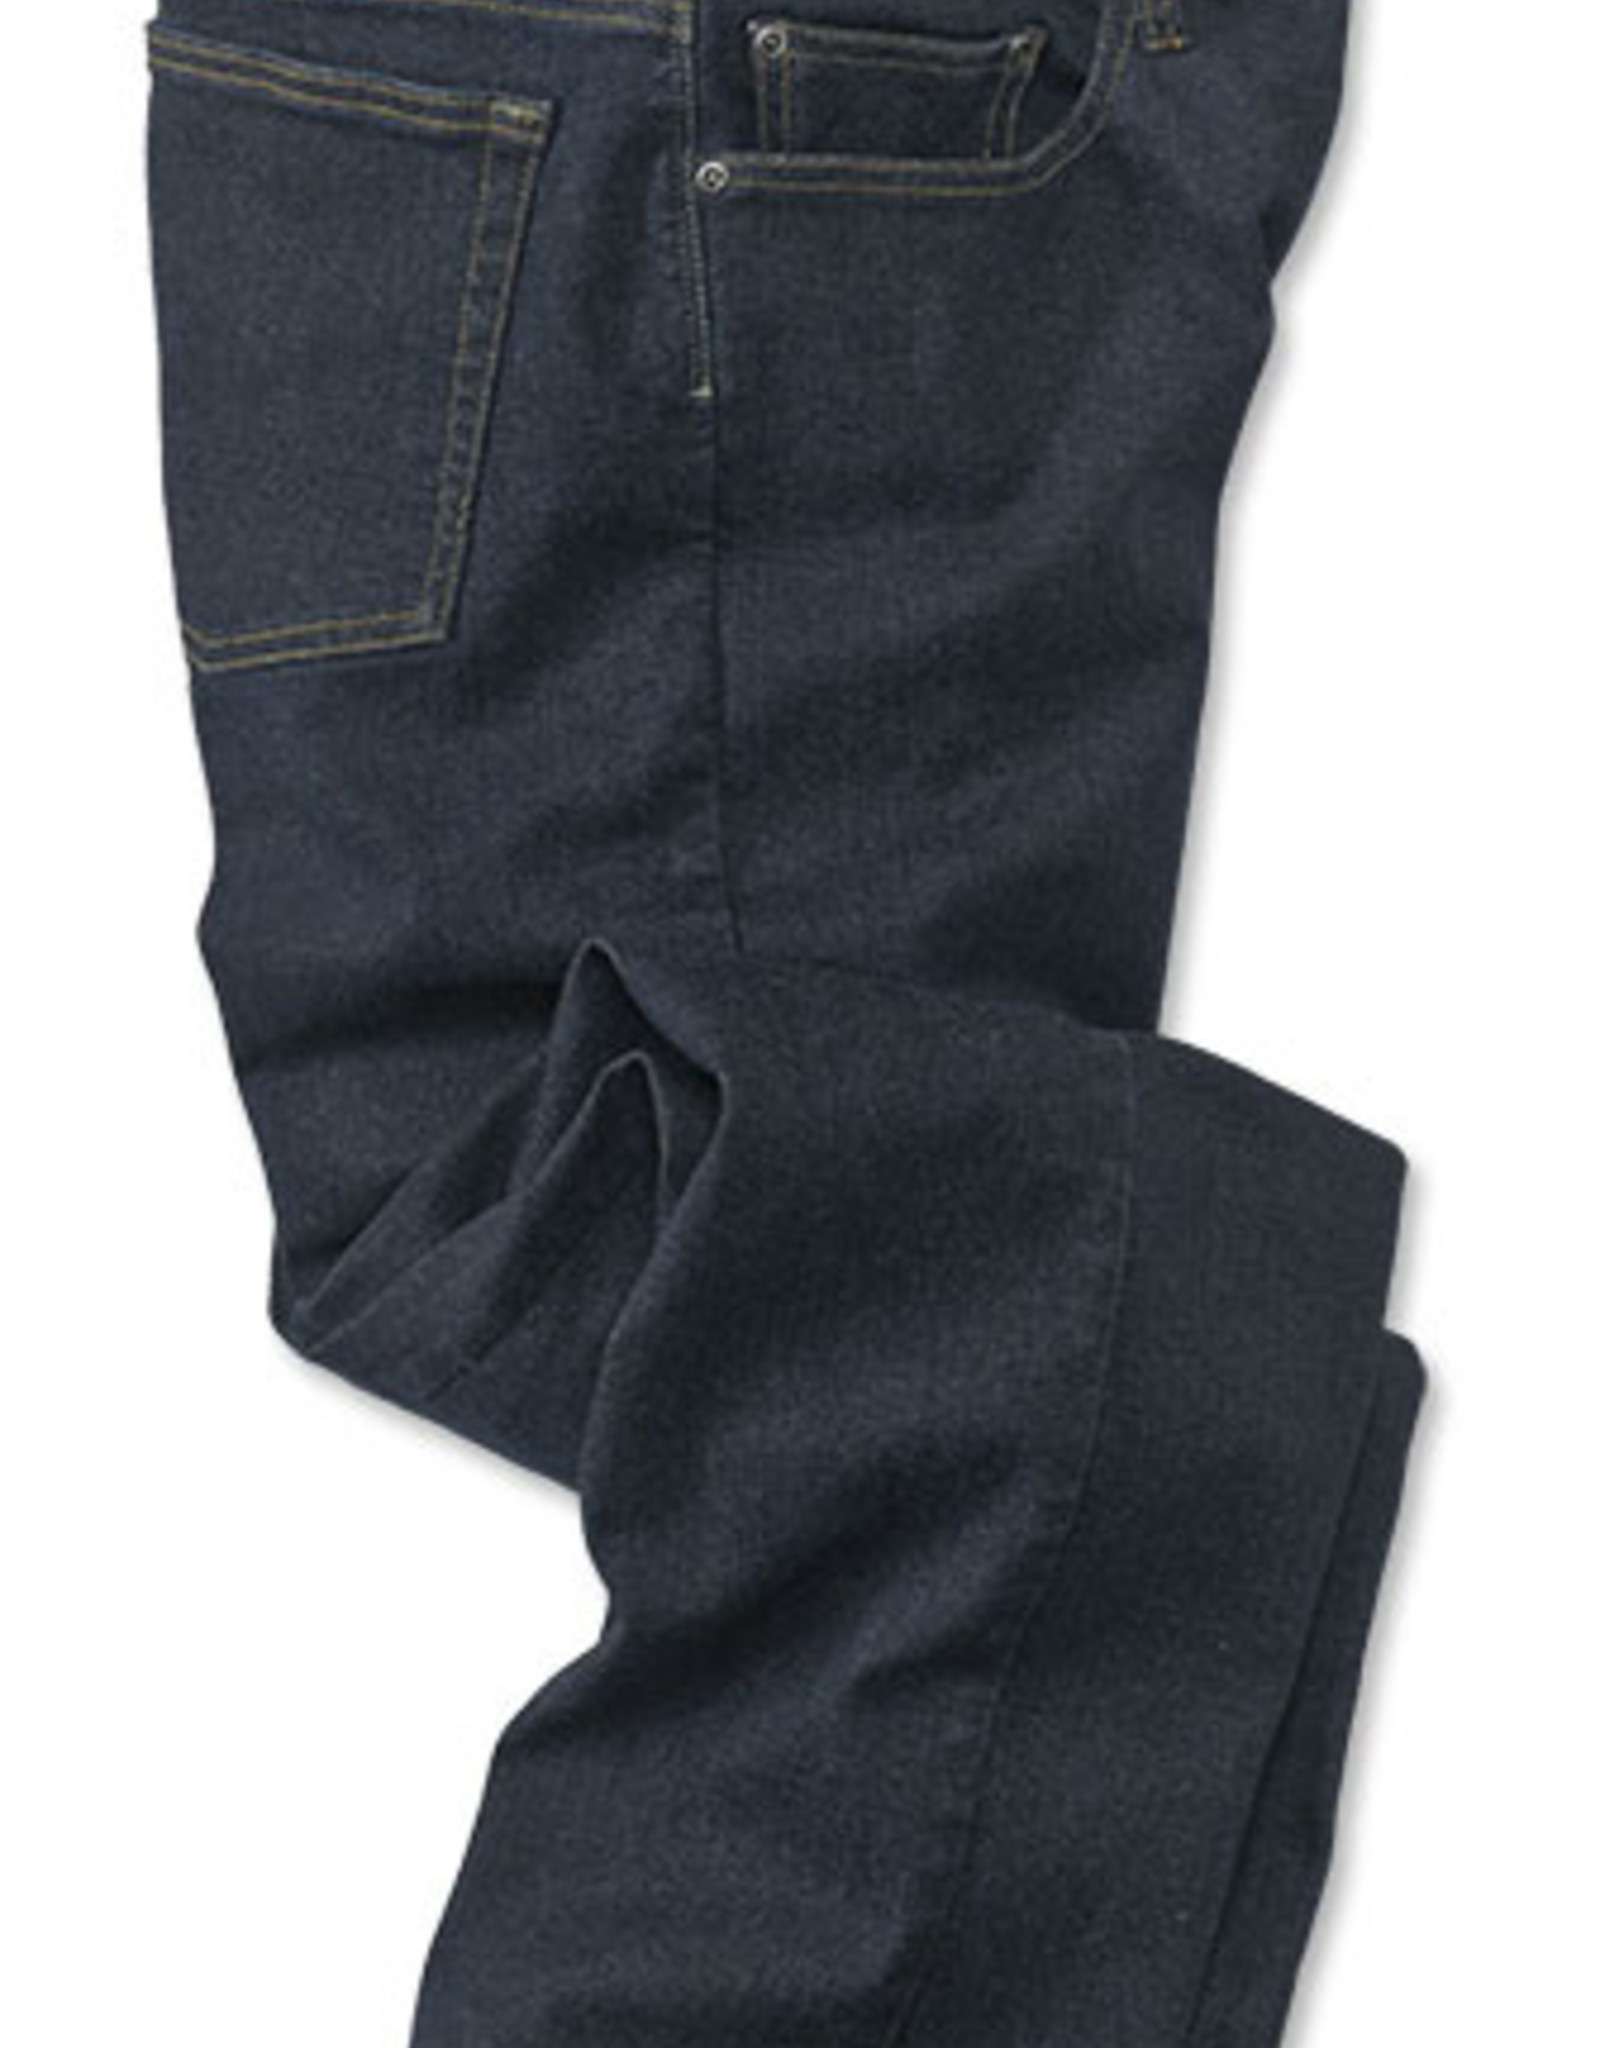 Orvis Men's 5 Pocket 1856 Stetch Denim